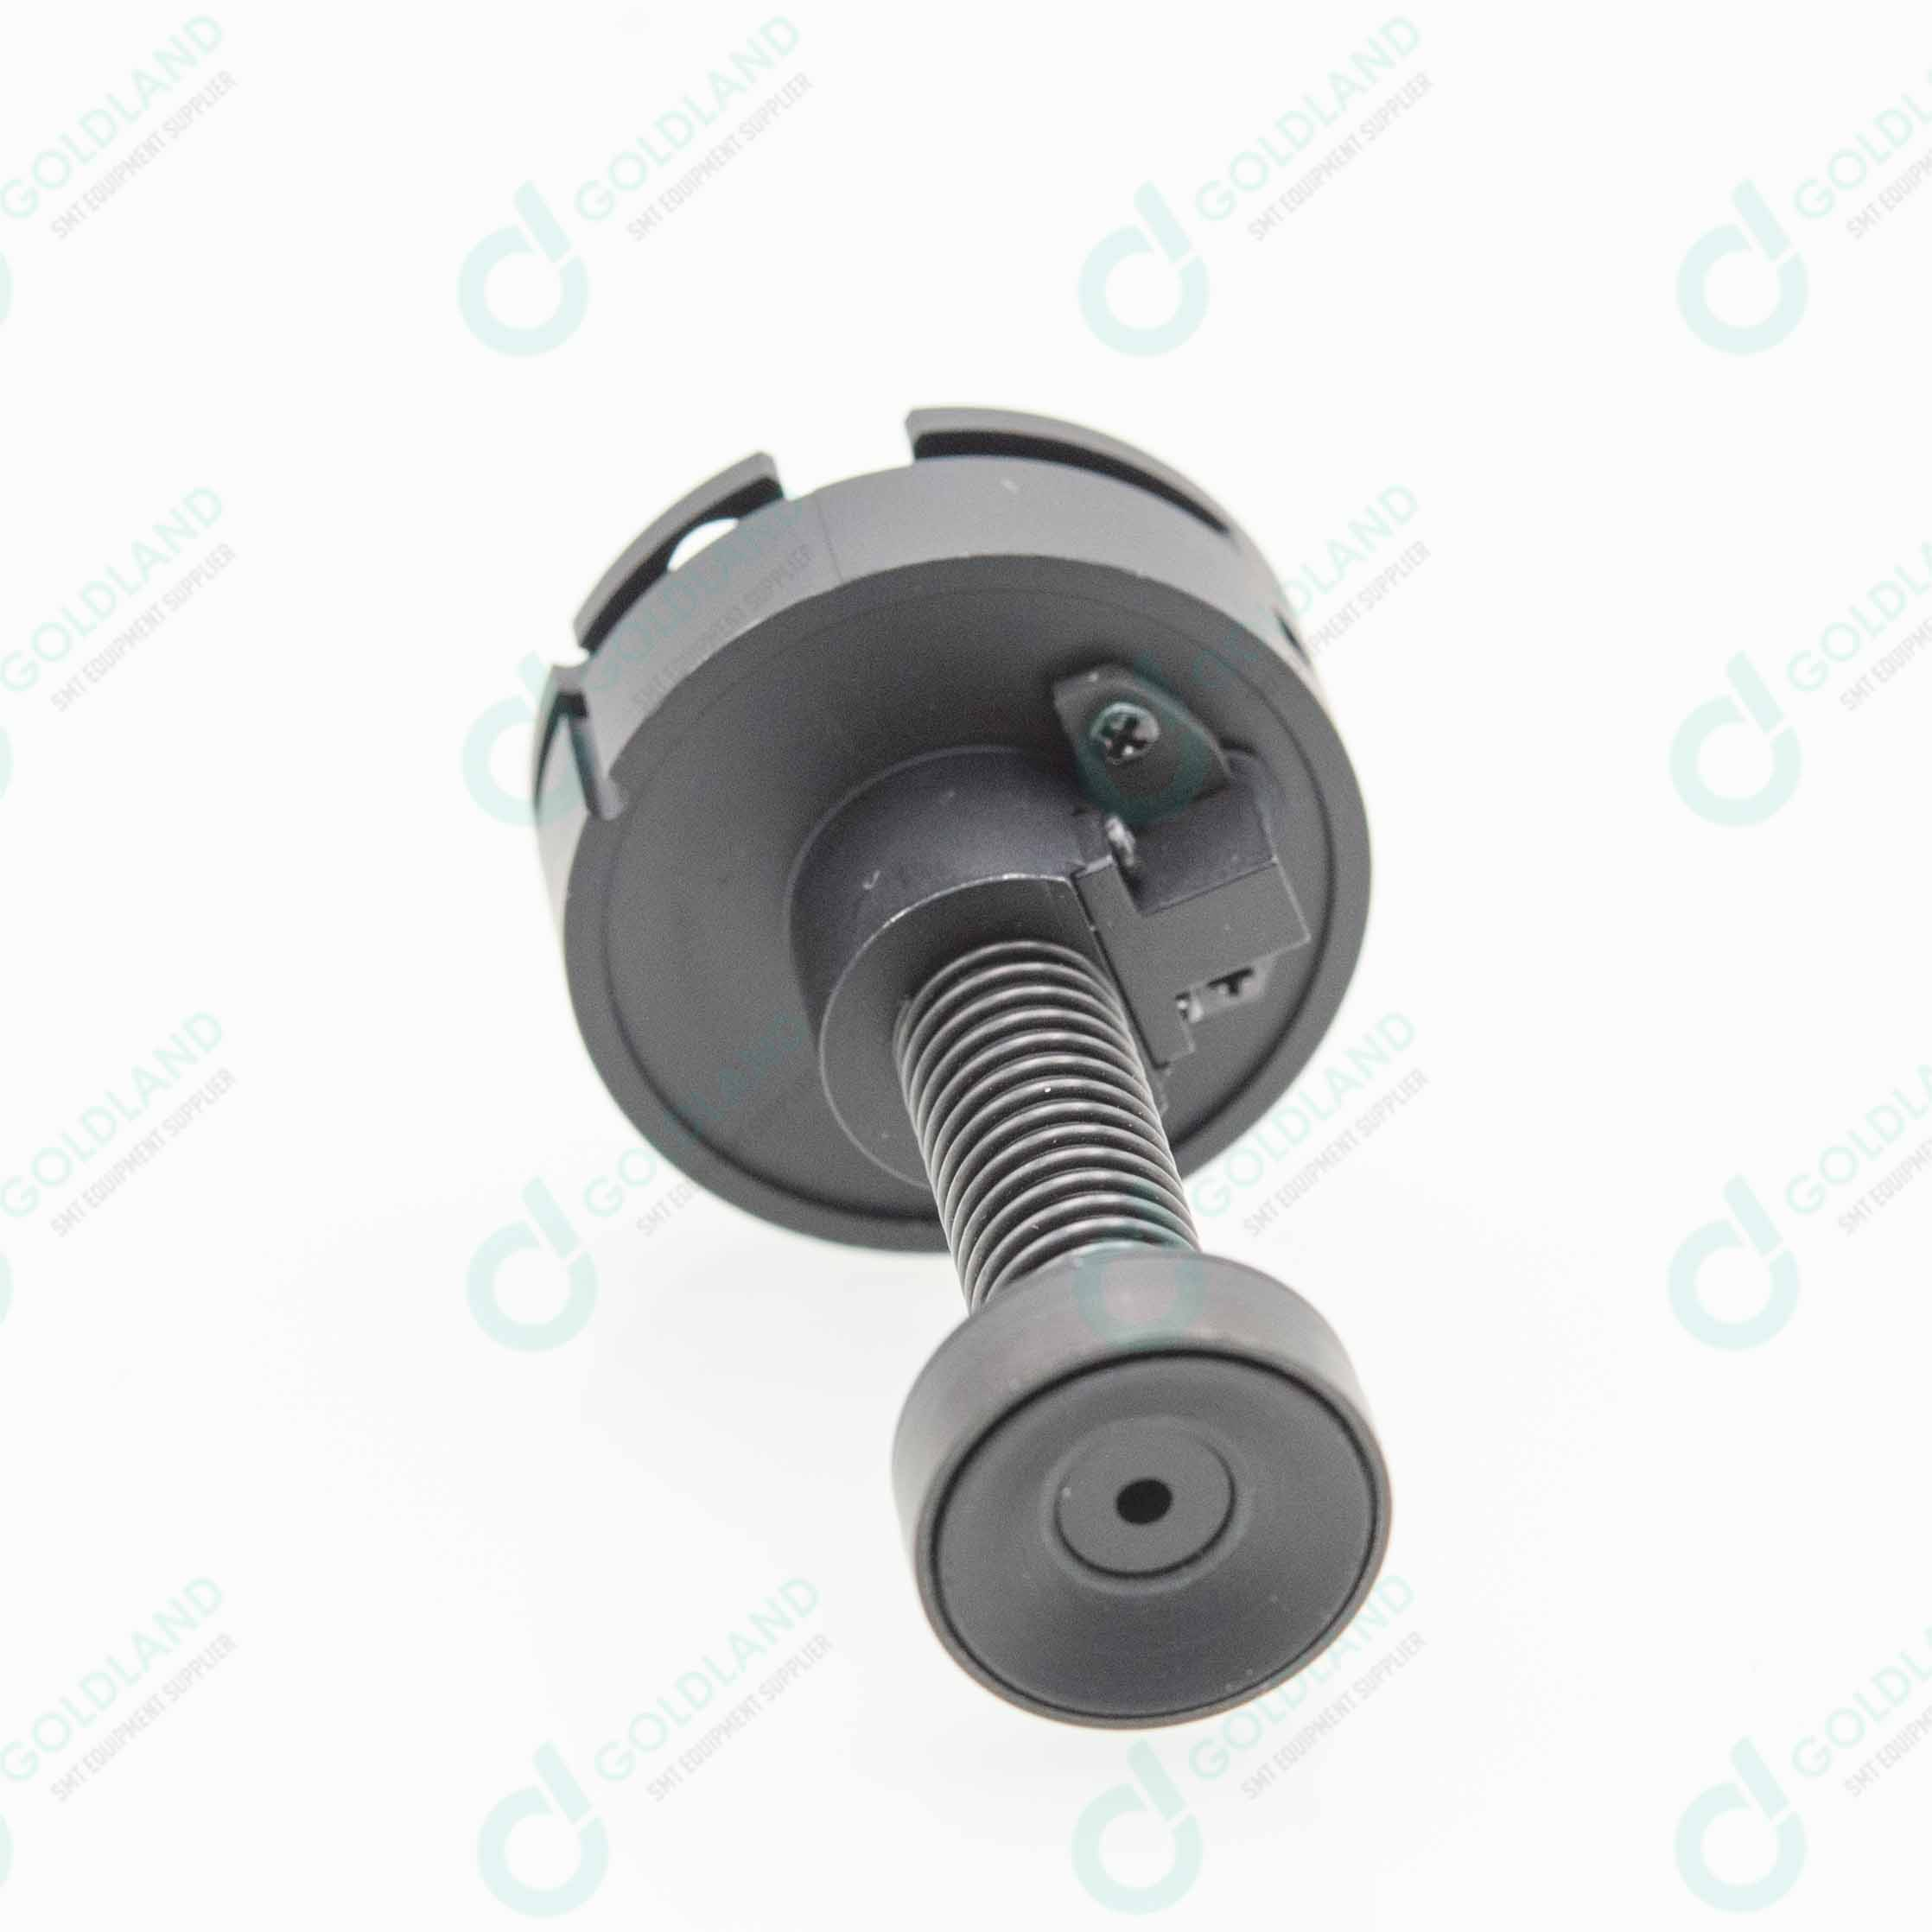 2AGKNL018500 FUJI Nozzle dia. 15.0G with rubber pad for FUJI smt machine parts